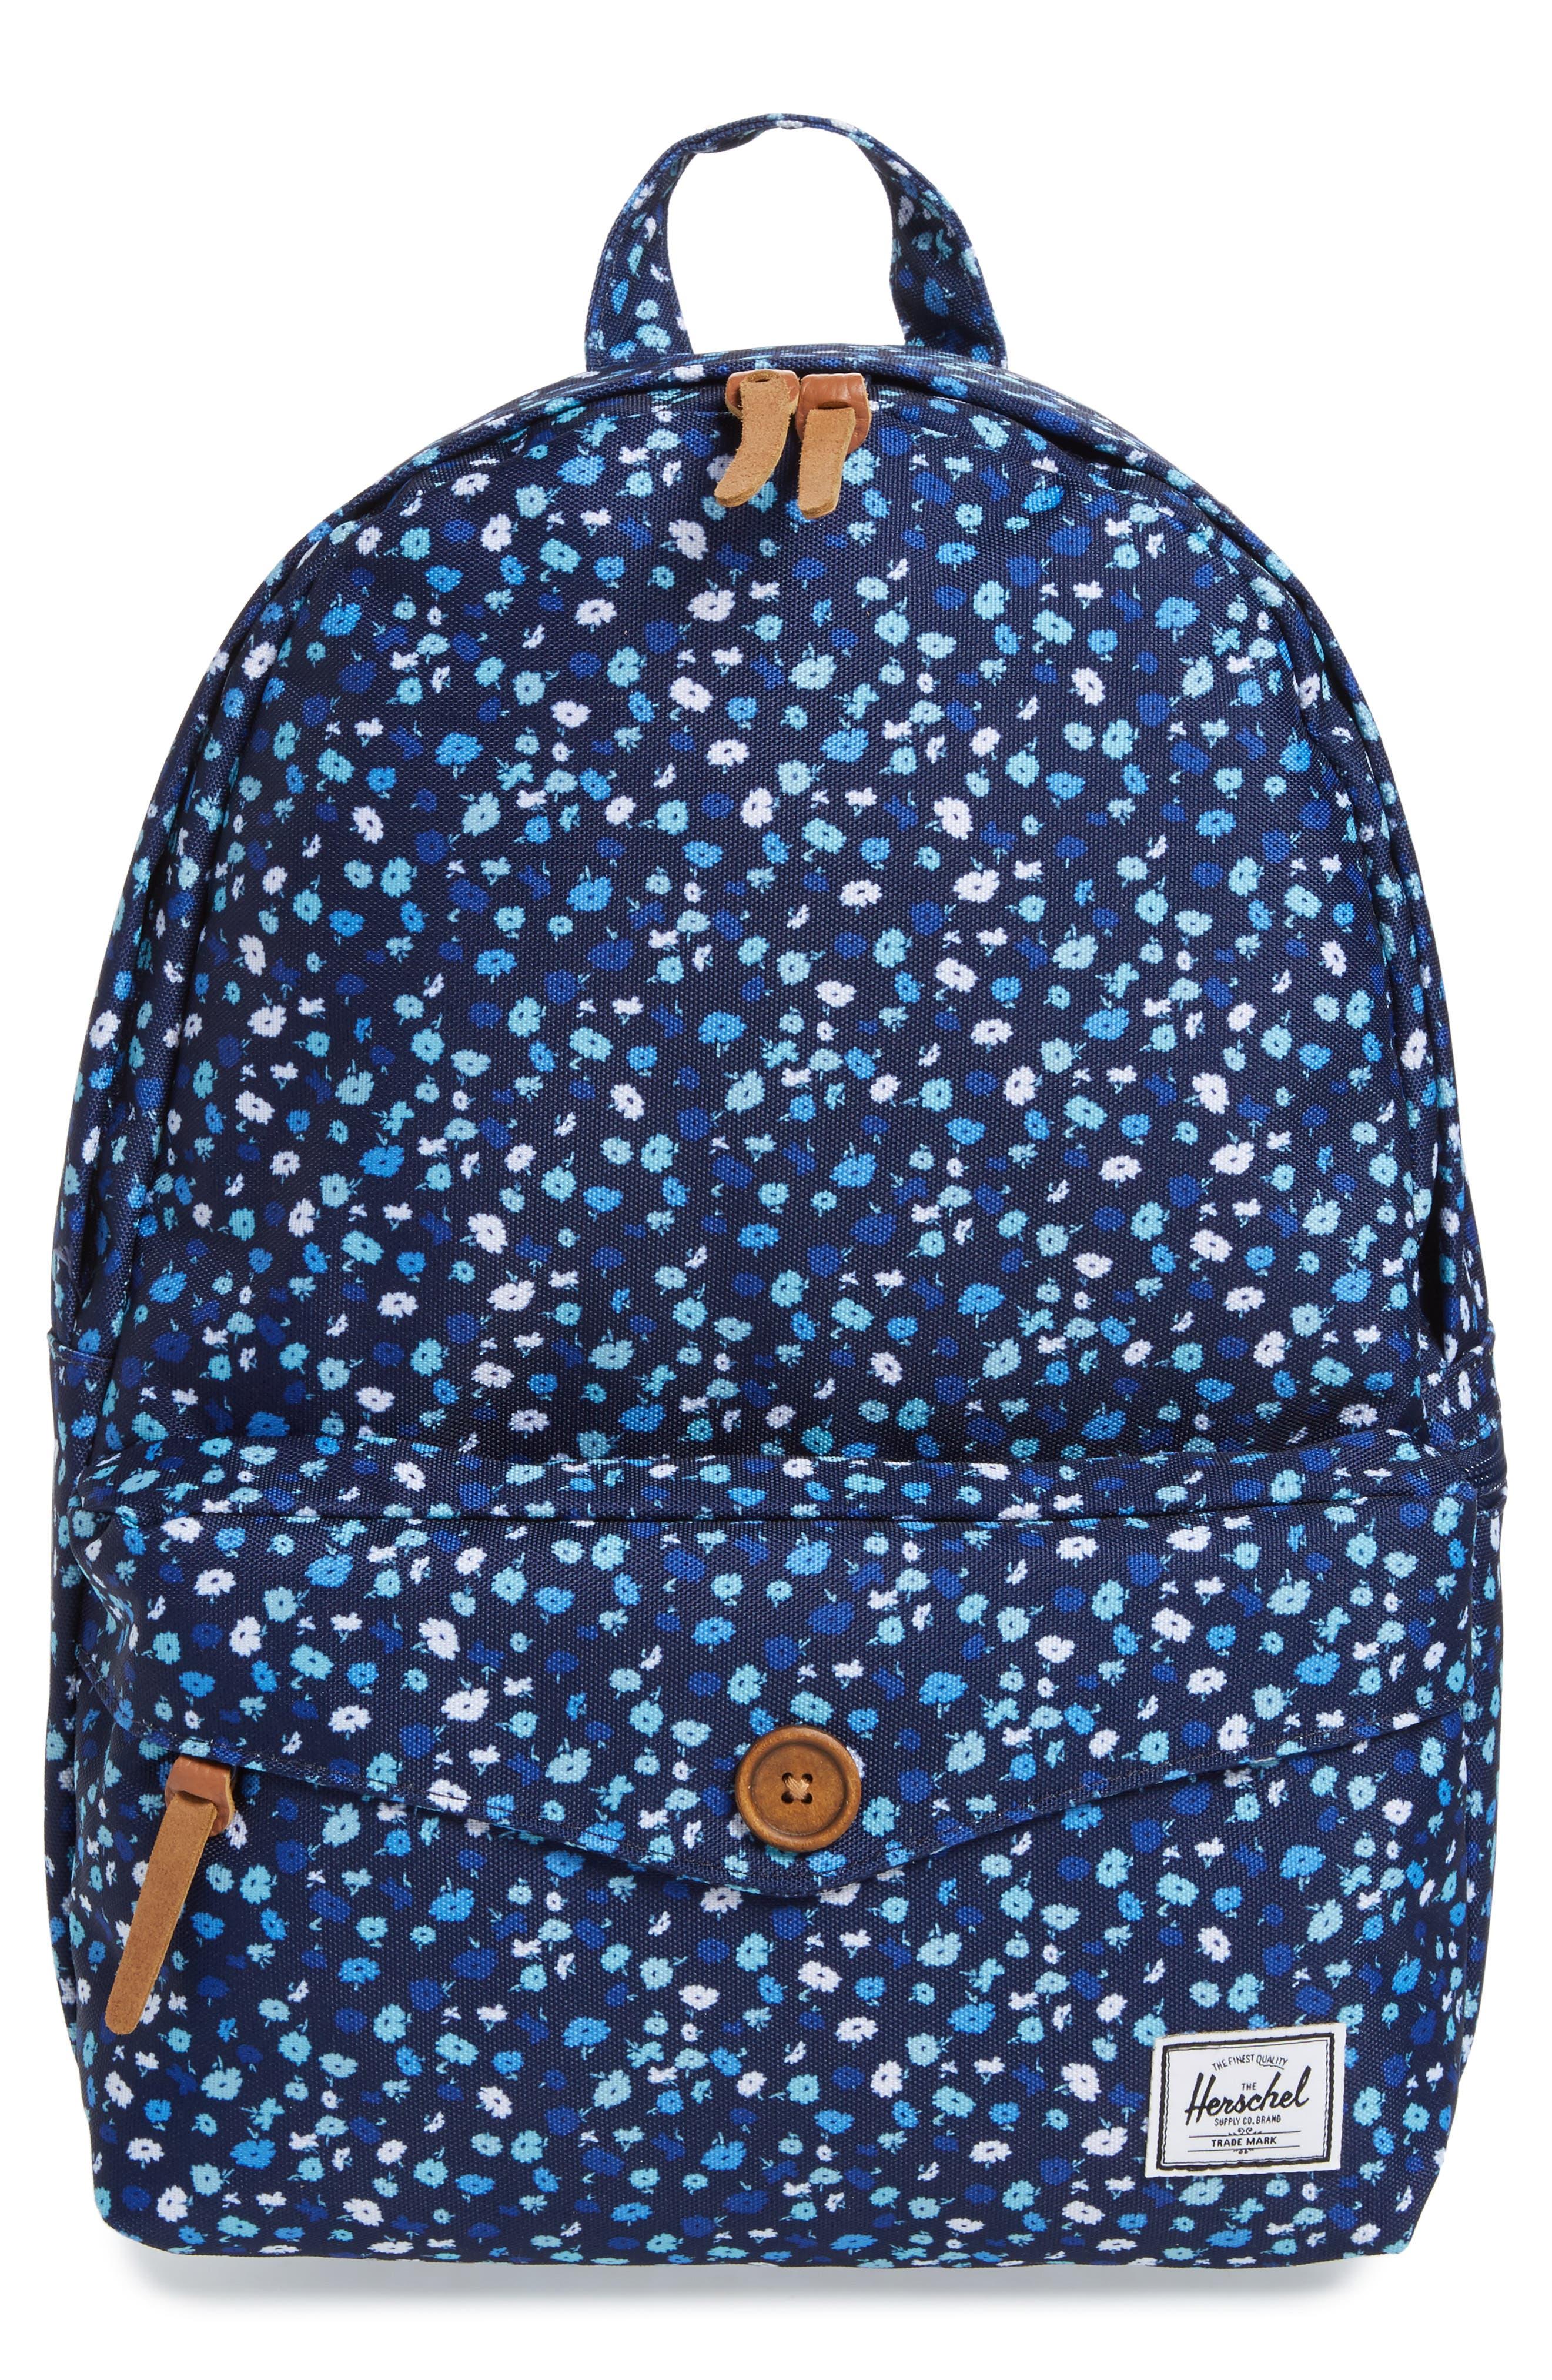 Herschel Supply Co. 'Sydney' Backpack